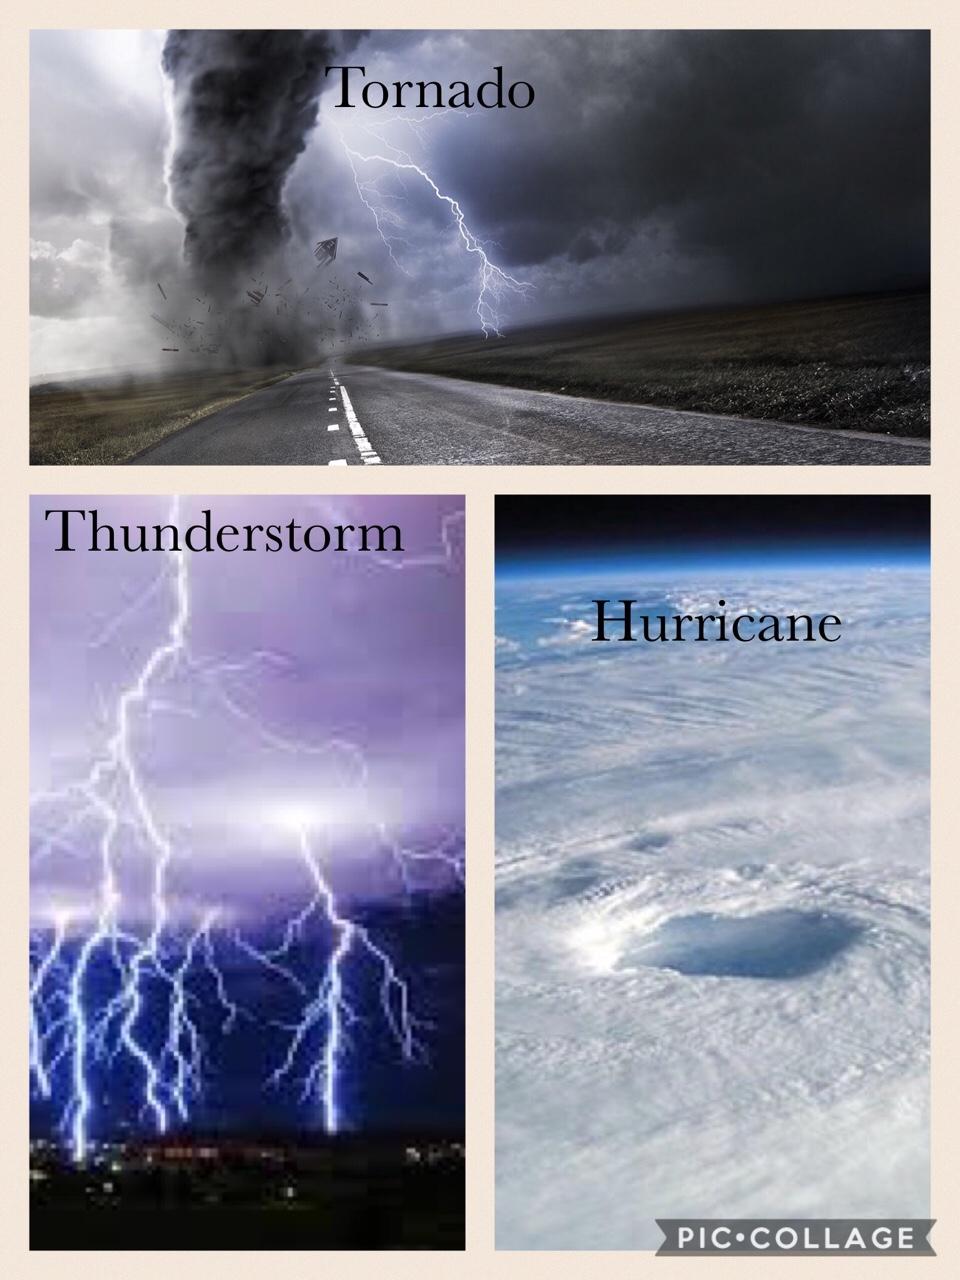 tornado vs cyclone